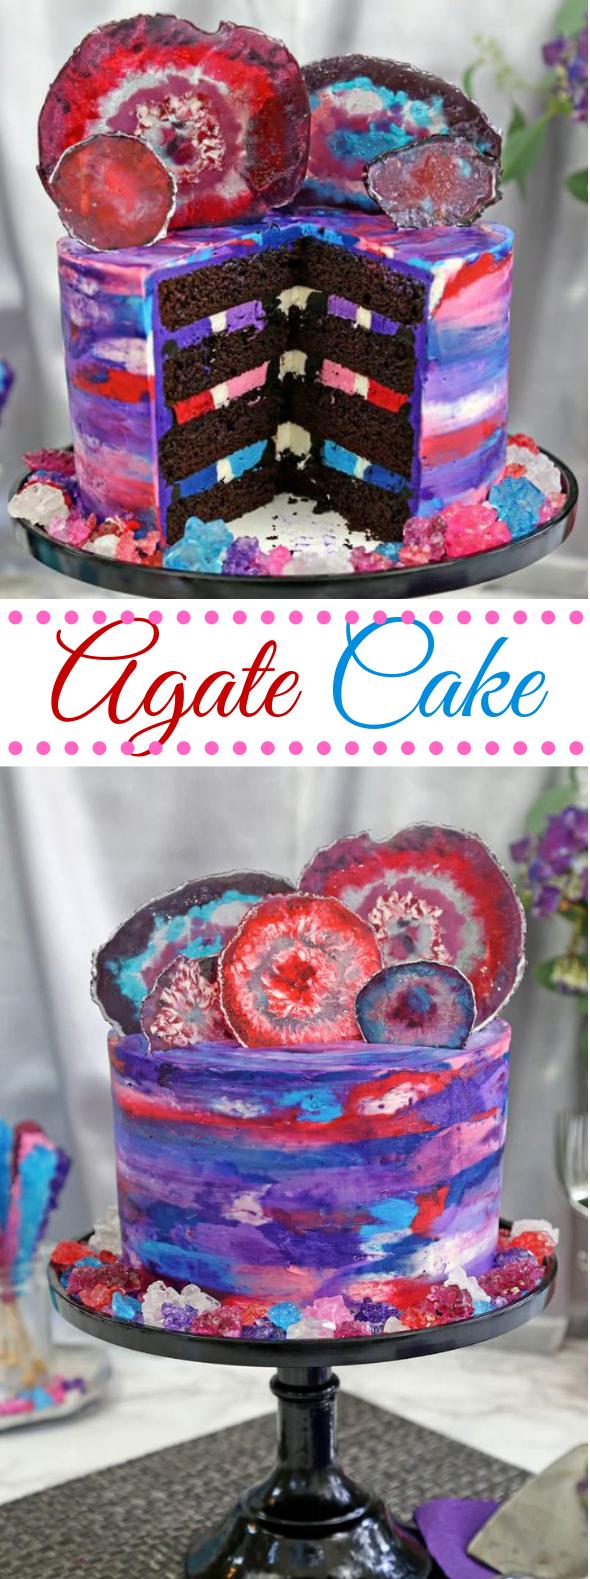 AGATE CAKE #birthdaycake #dessert